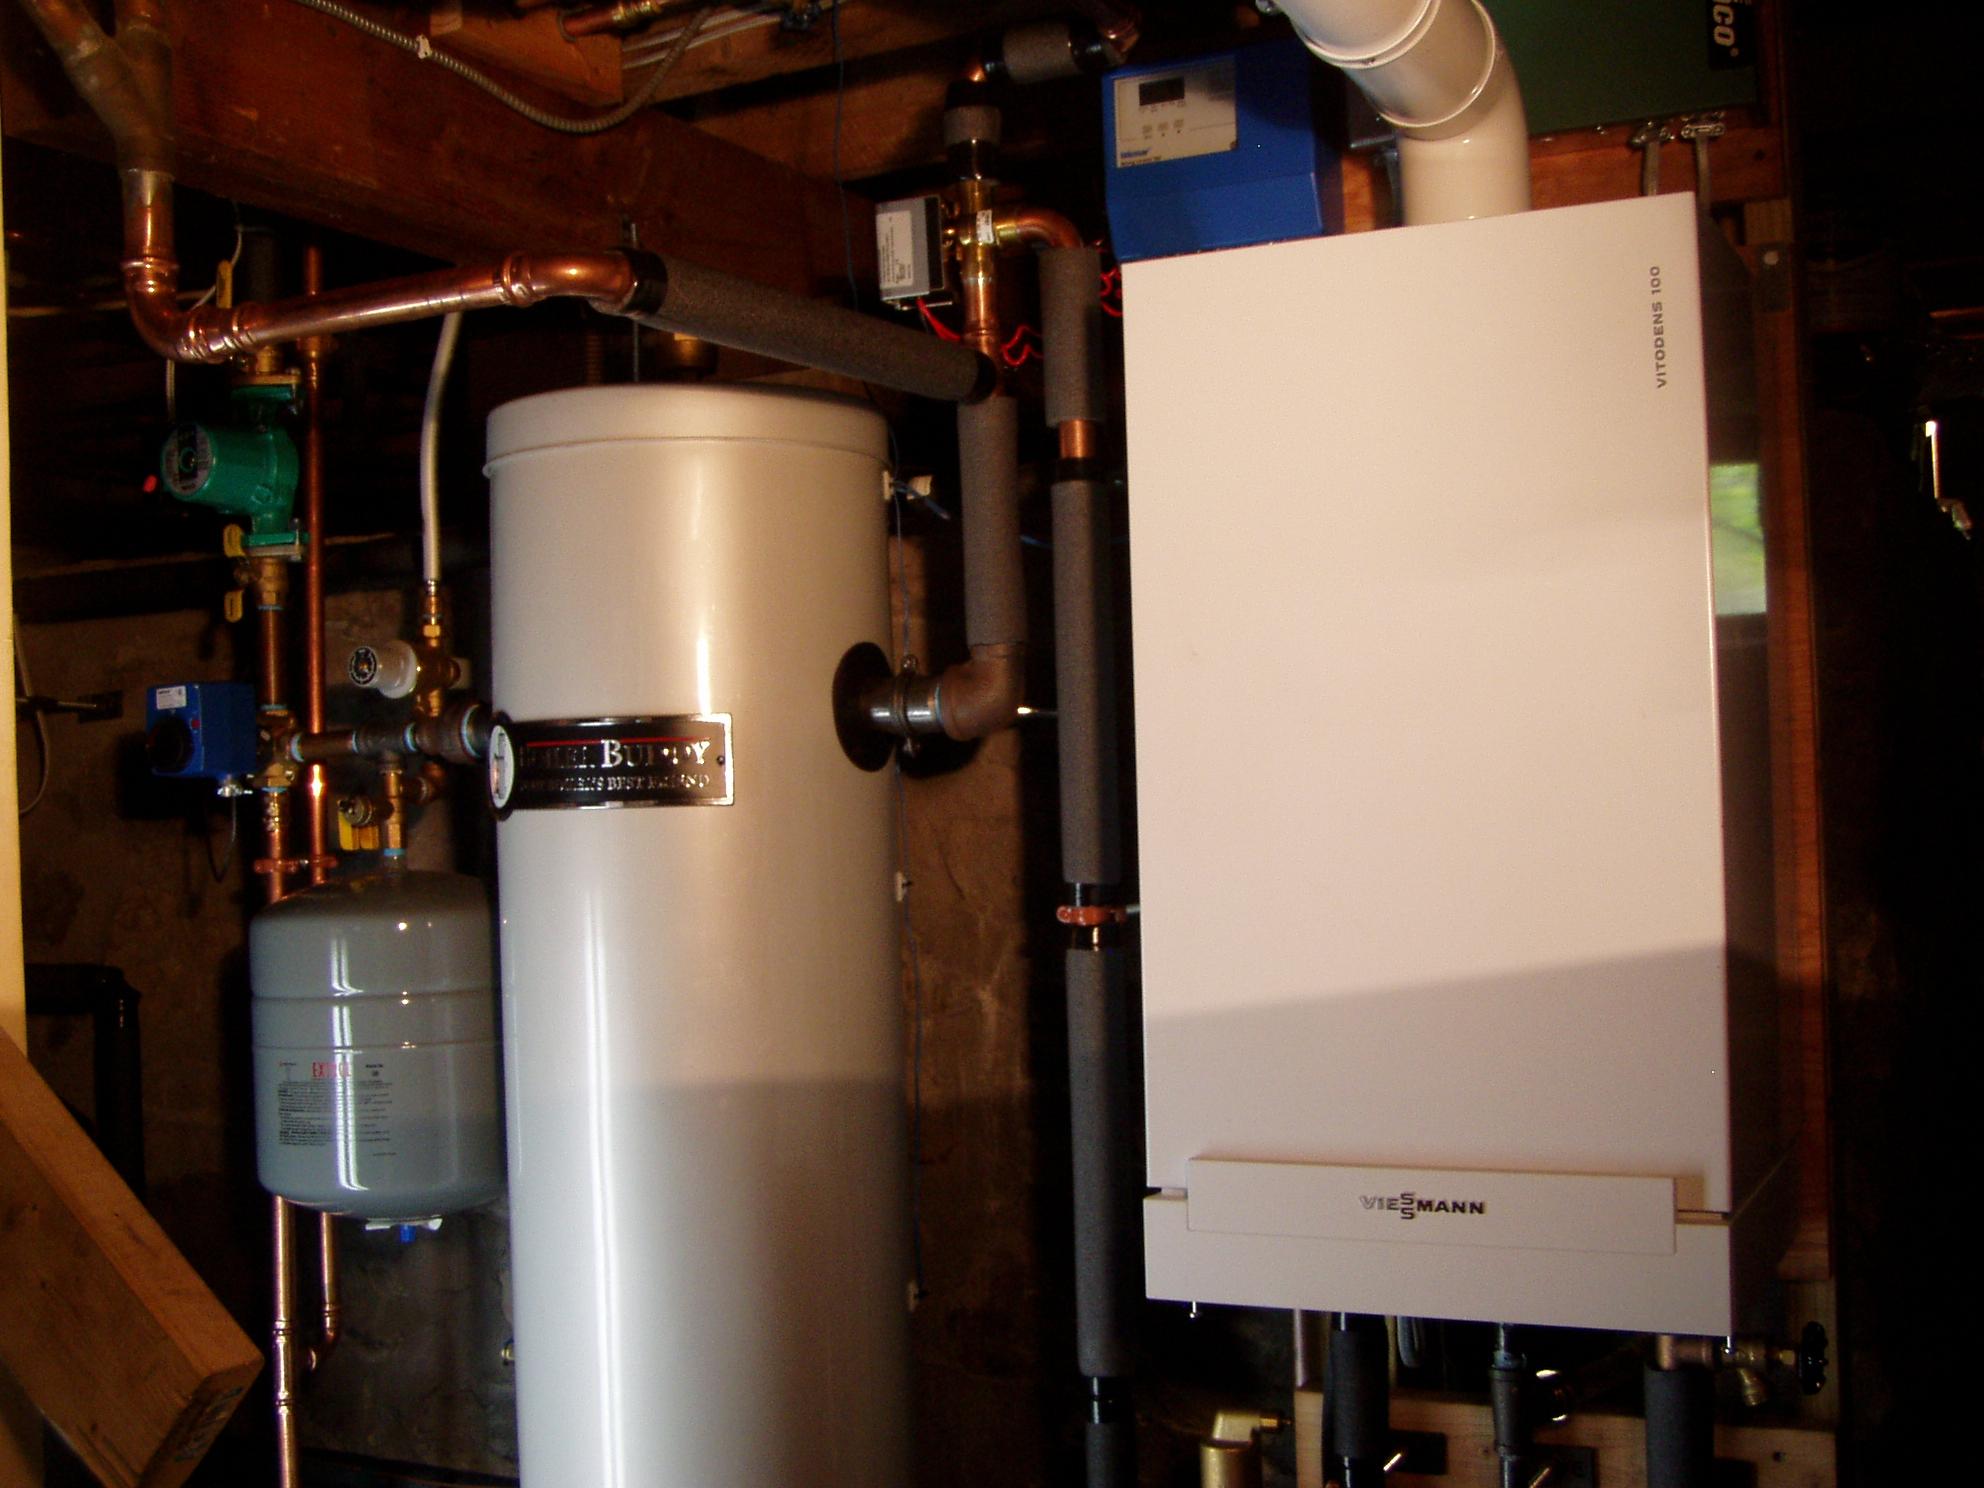 Hot Water Boilers Residential ~ Boiler water storage tank hot tanks